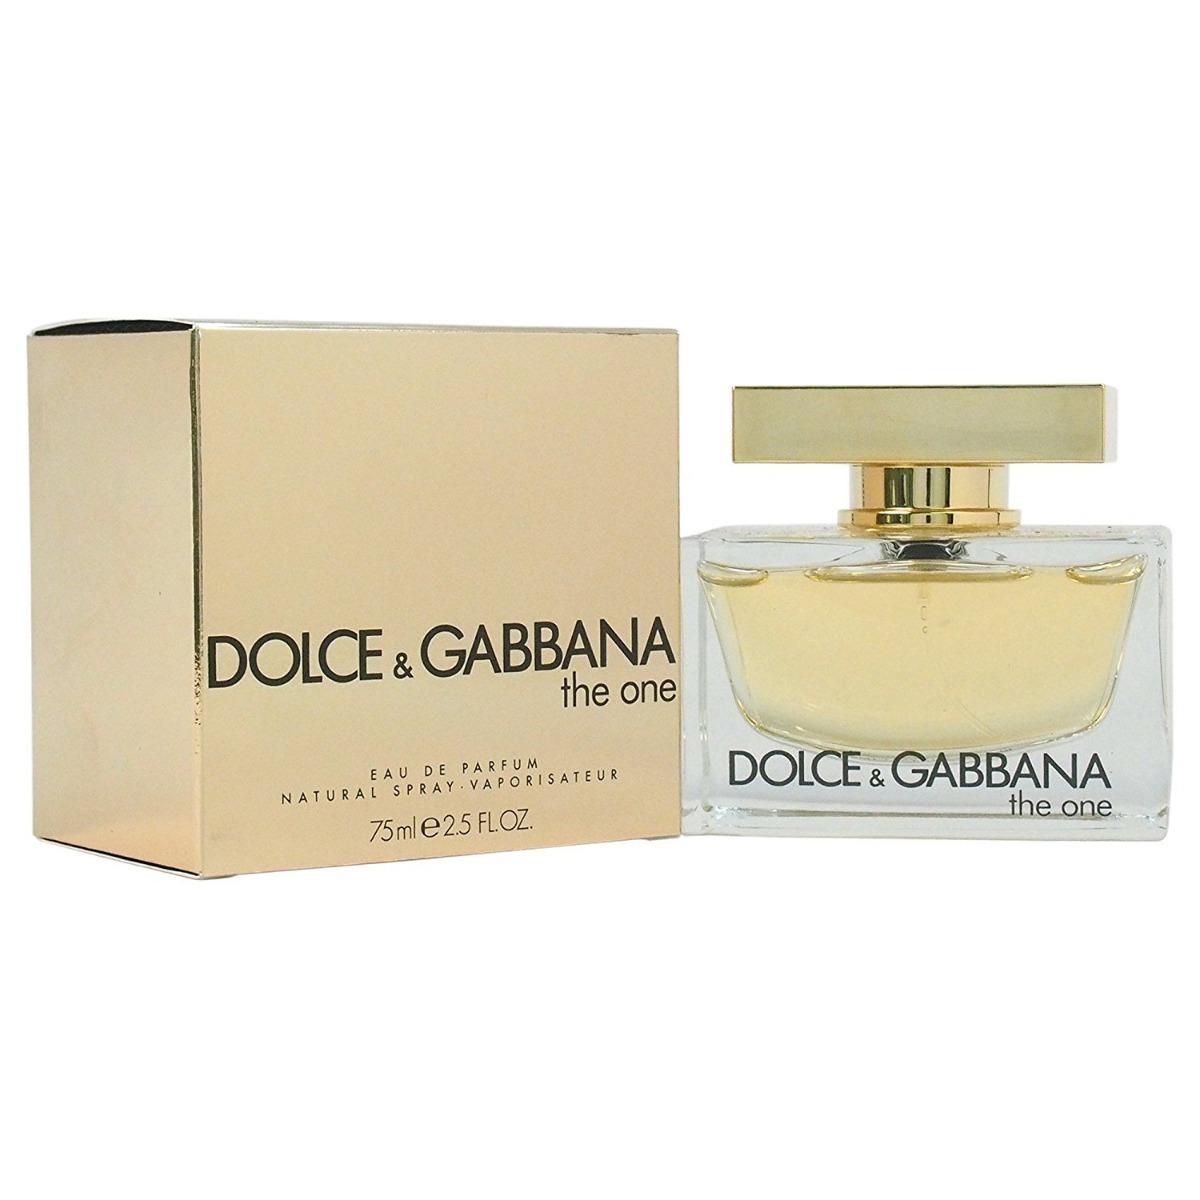 Perfume Original Ml Gabbana One 75 Dolceamp; The Mujer ExoeWQrBdC